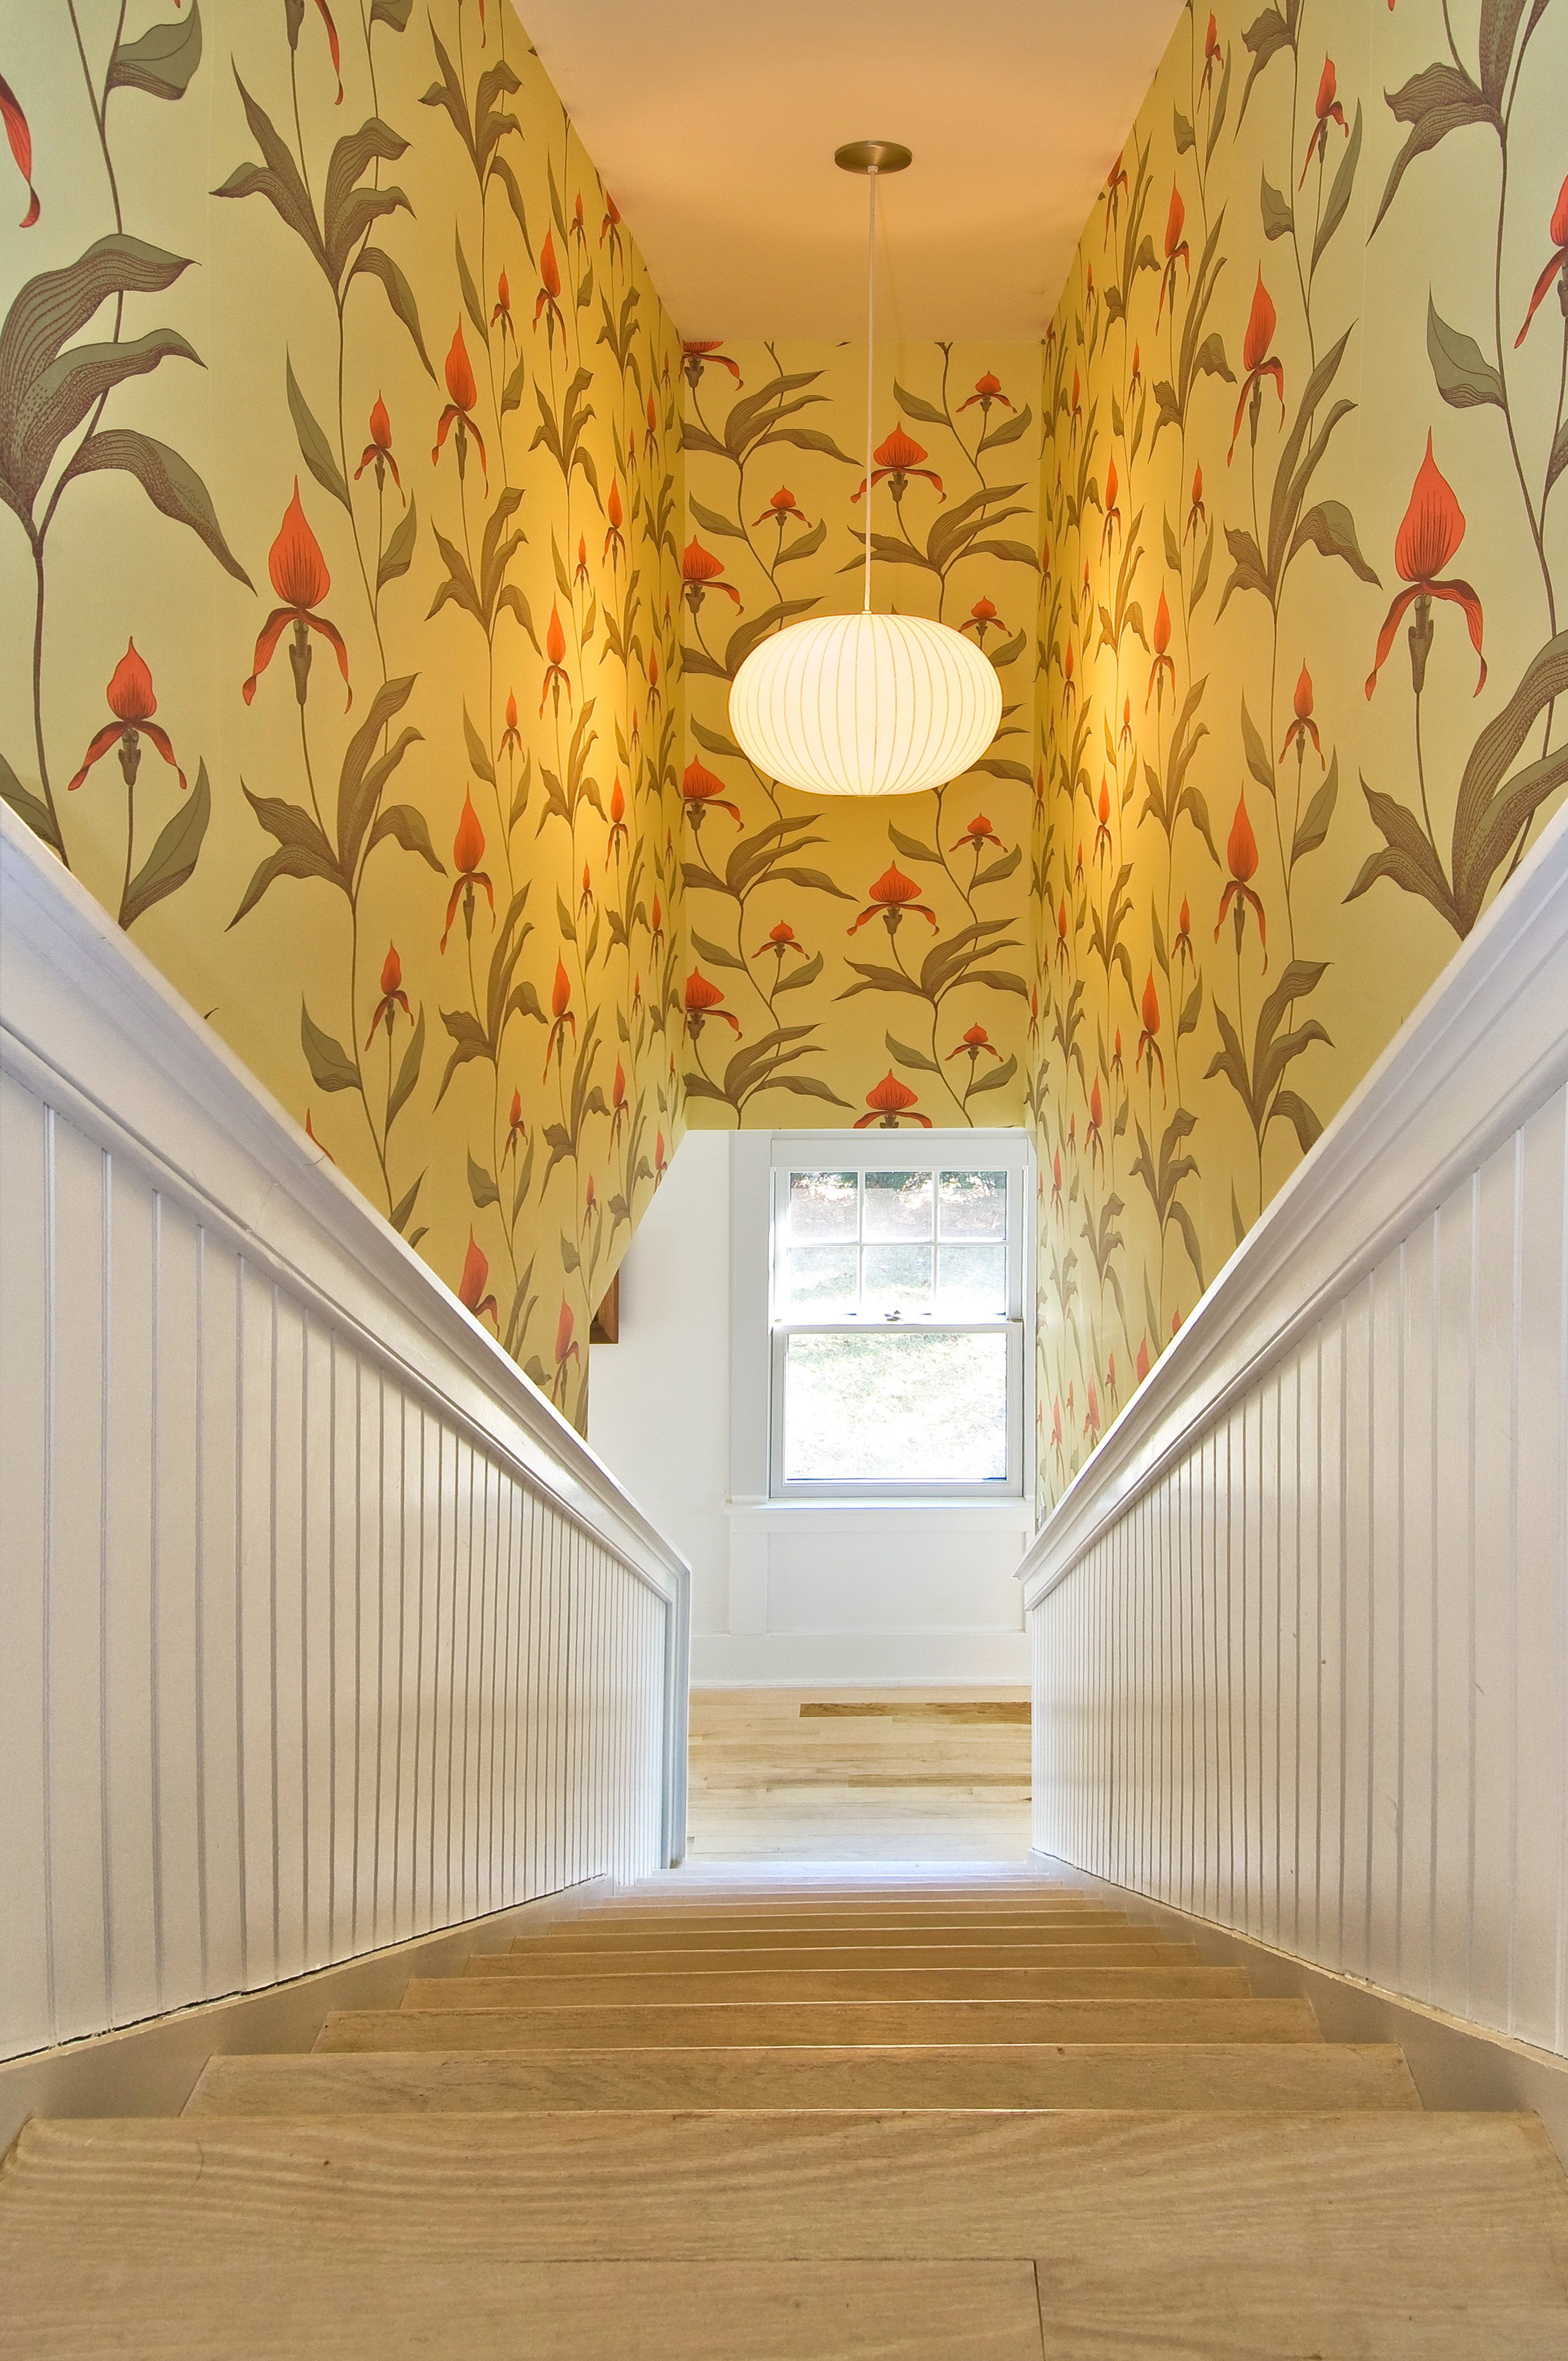 12 Beautiful Rooms That Will Make You Love Wallpaper Again